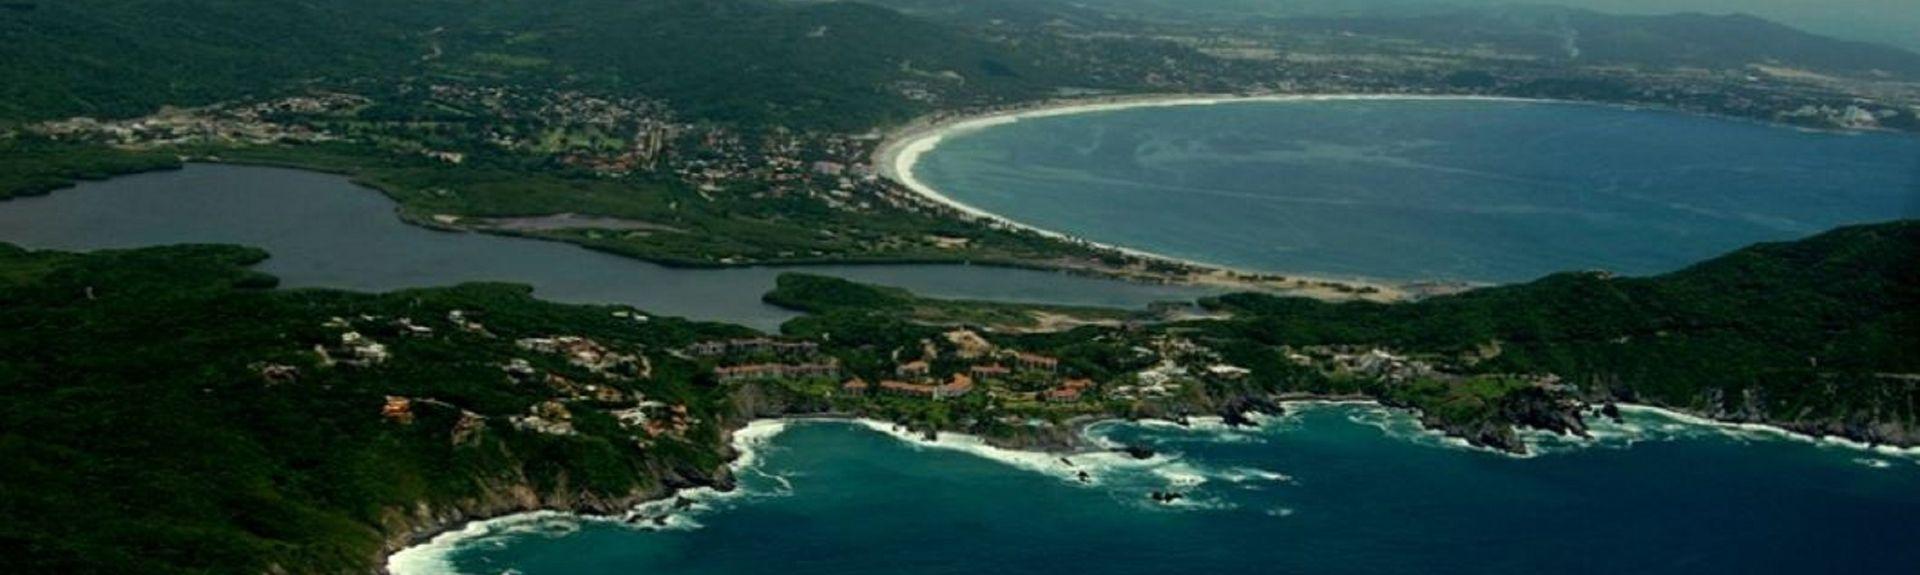 Playa San Pedrito, Manzanillo, Colima, Mexico